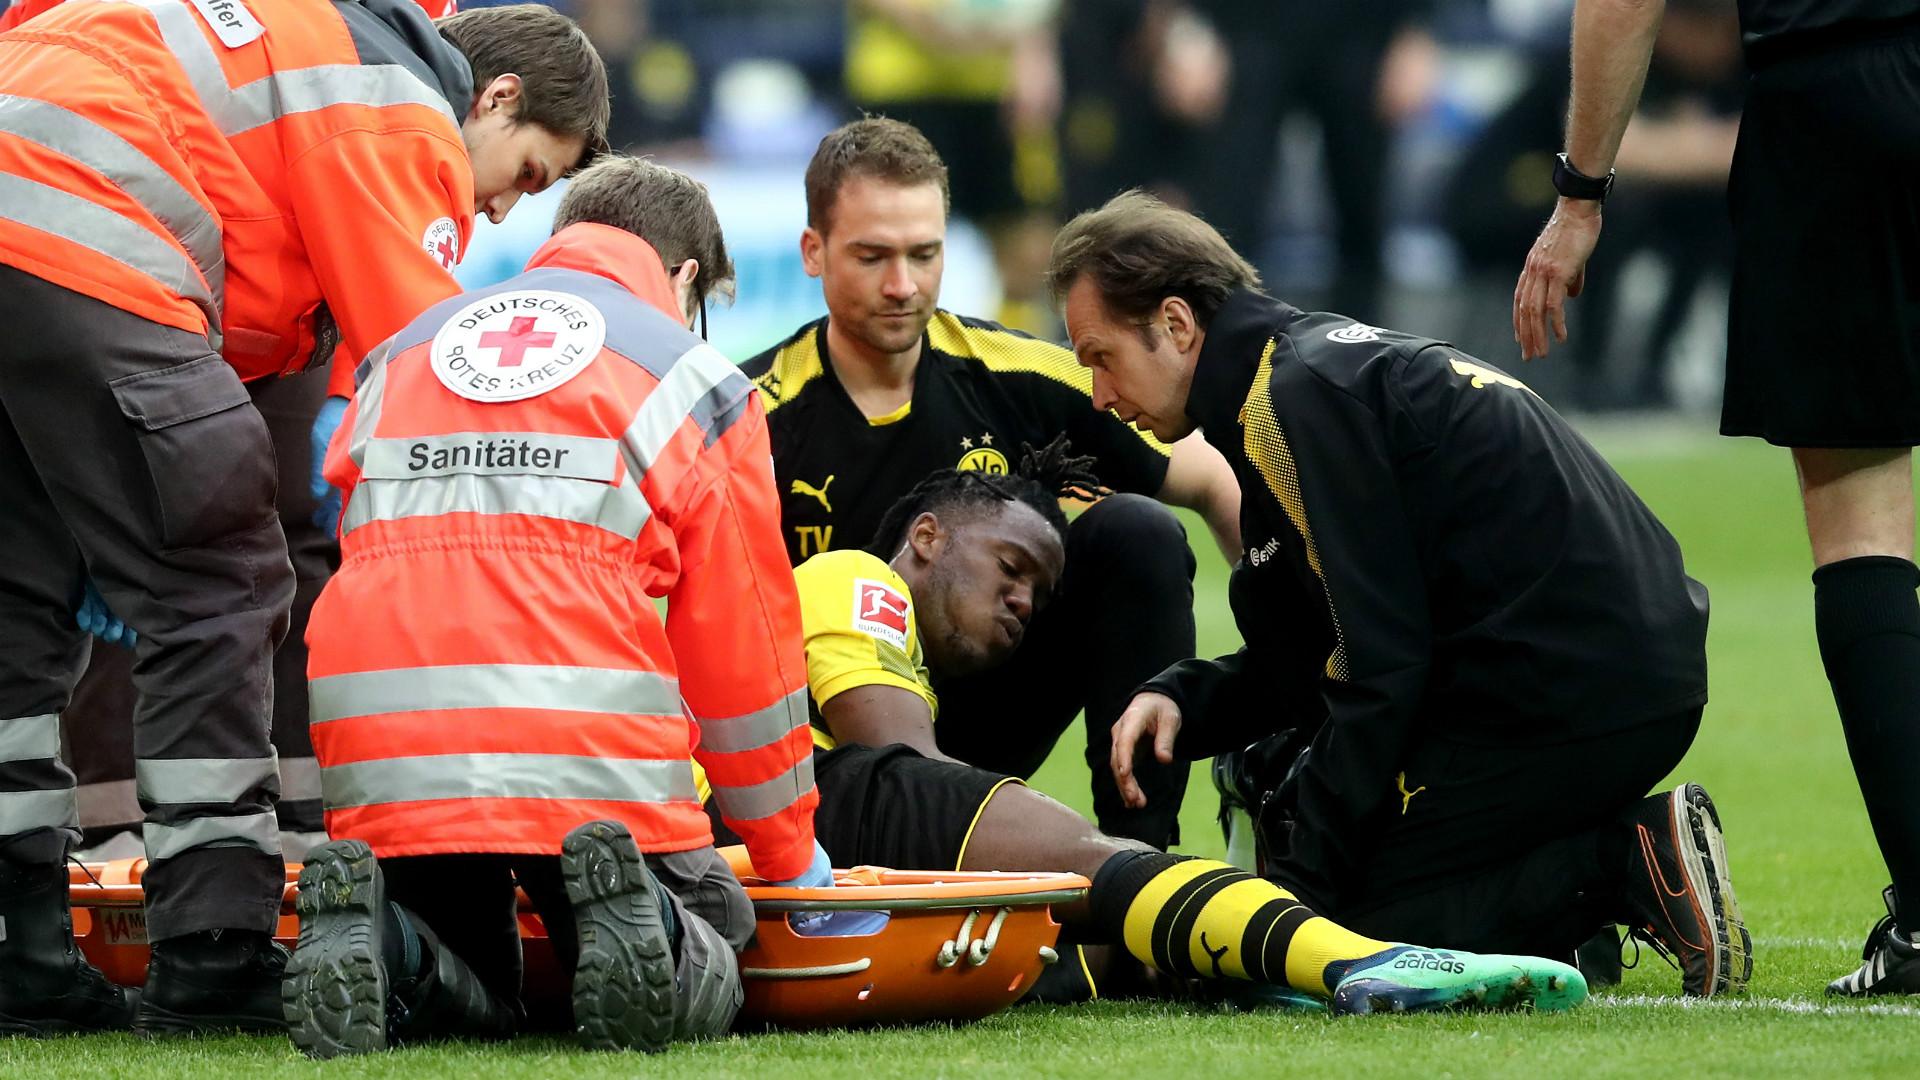 Verdacht auf Knöchelbruch! BVB-Stürmer Batshuayi droht WM-Aus